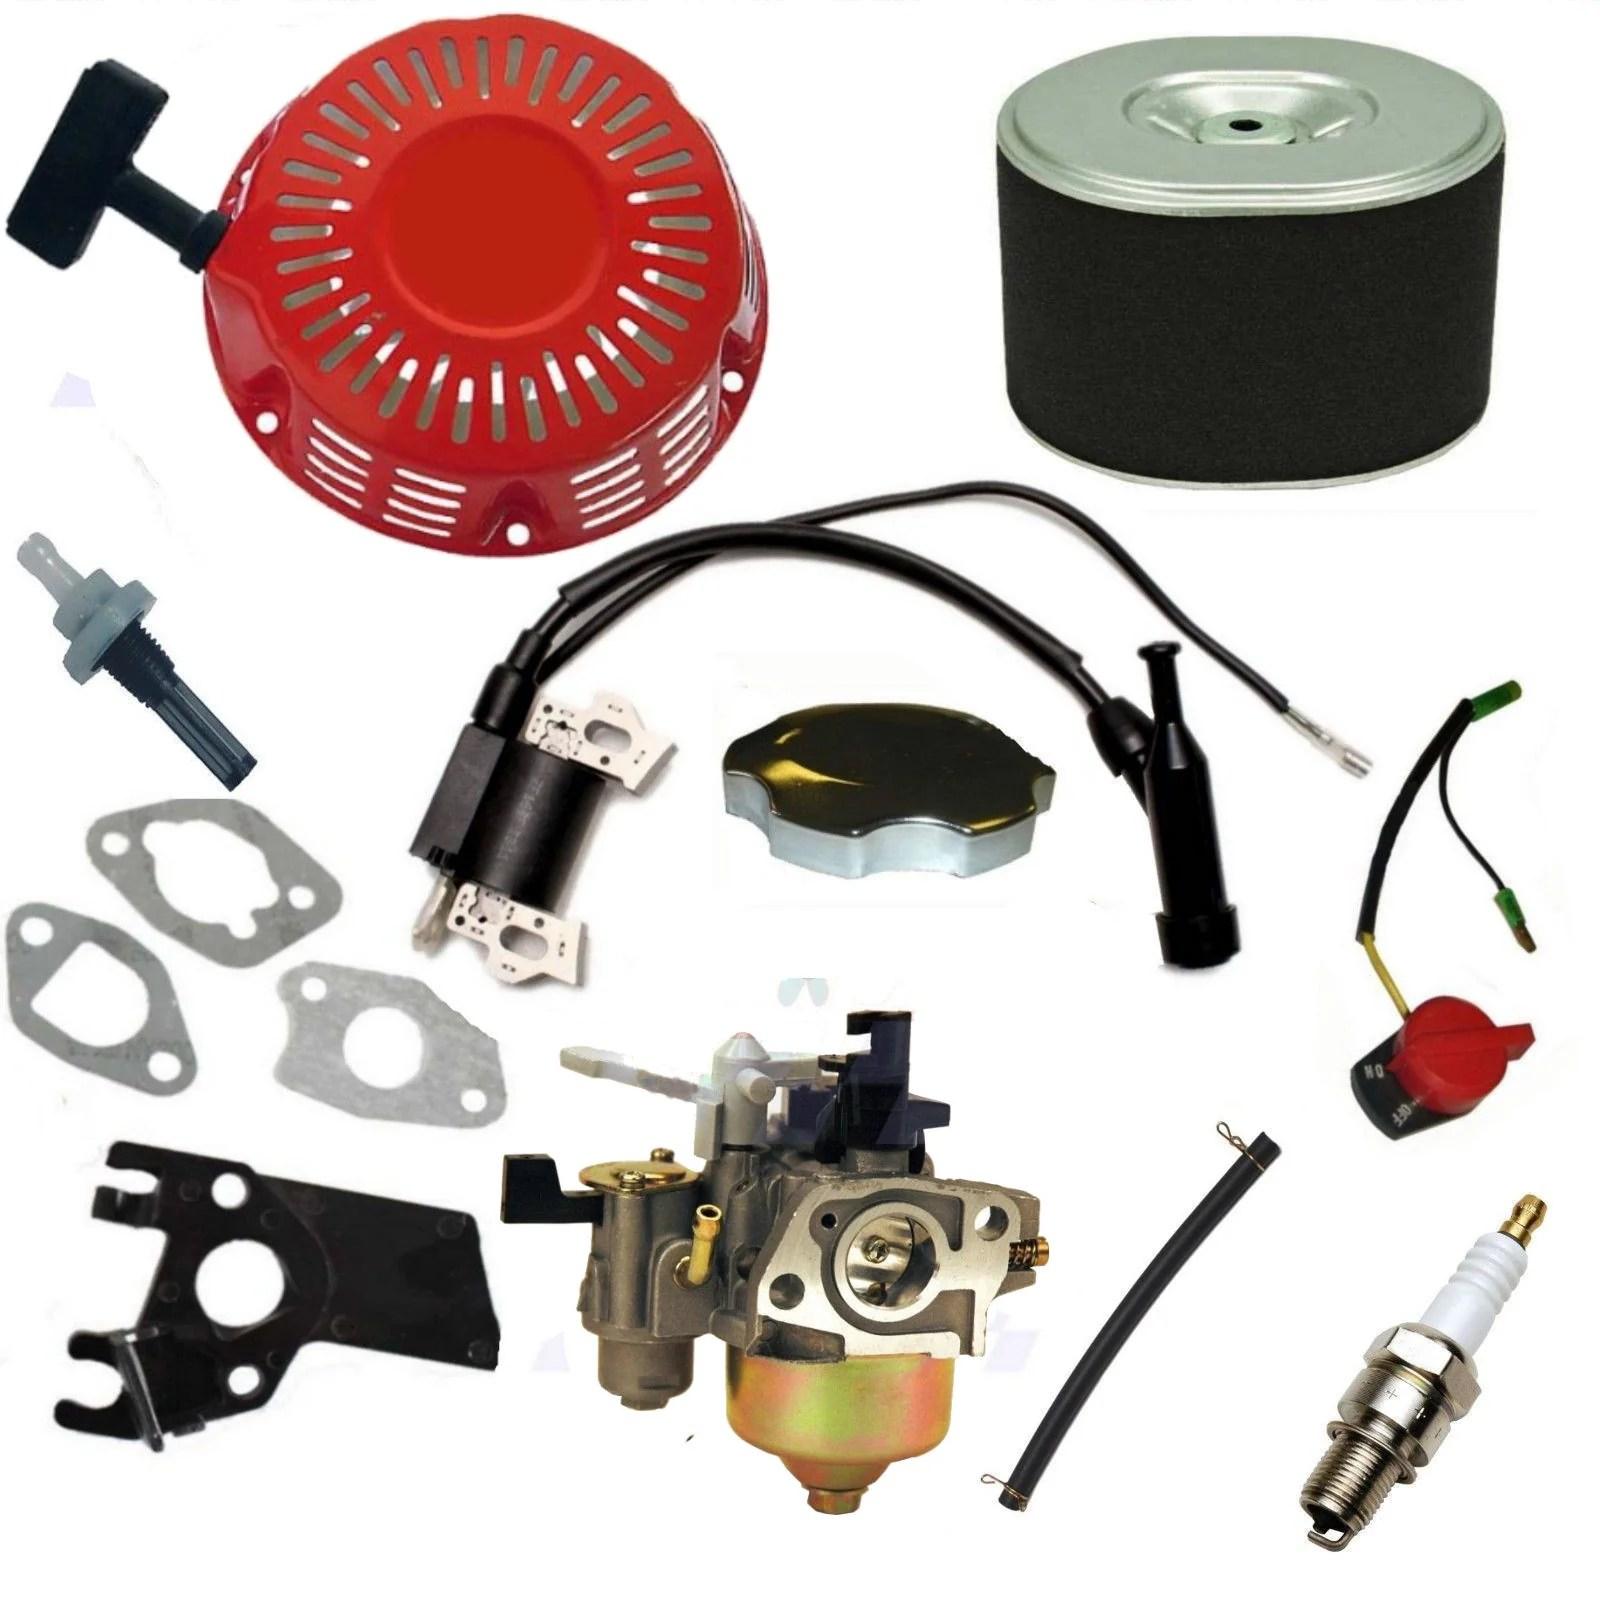 medium resolution of new honda gx390 recoil carburetor ignition coil spark plug air honda gx390 solenoid honda gx390 wiring plug